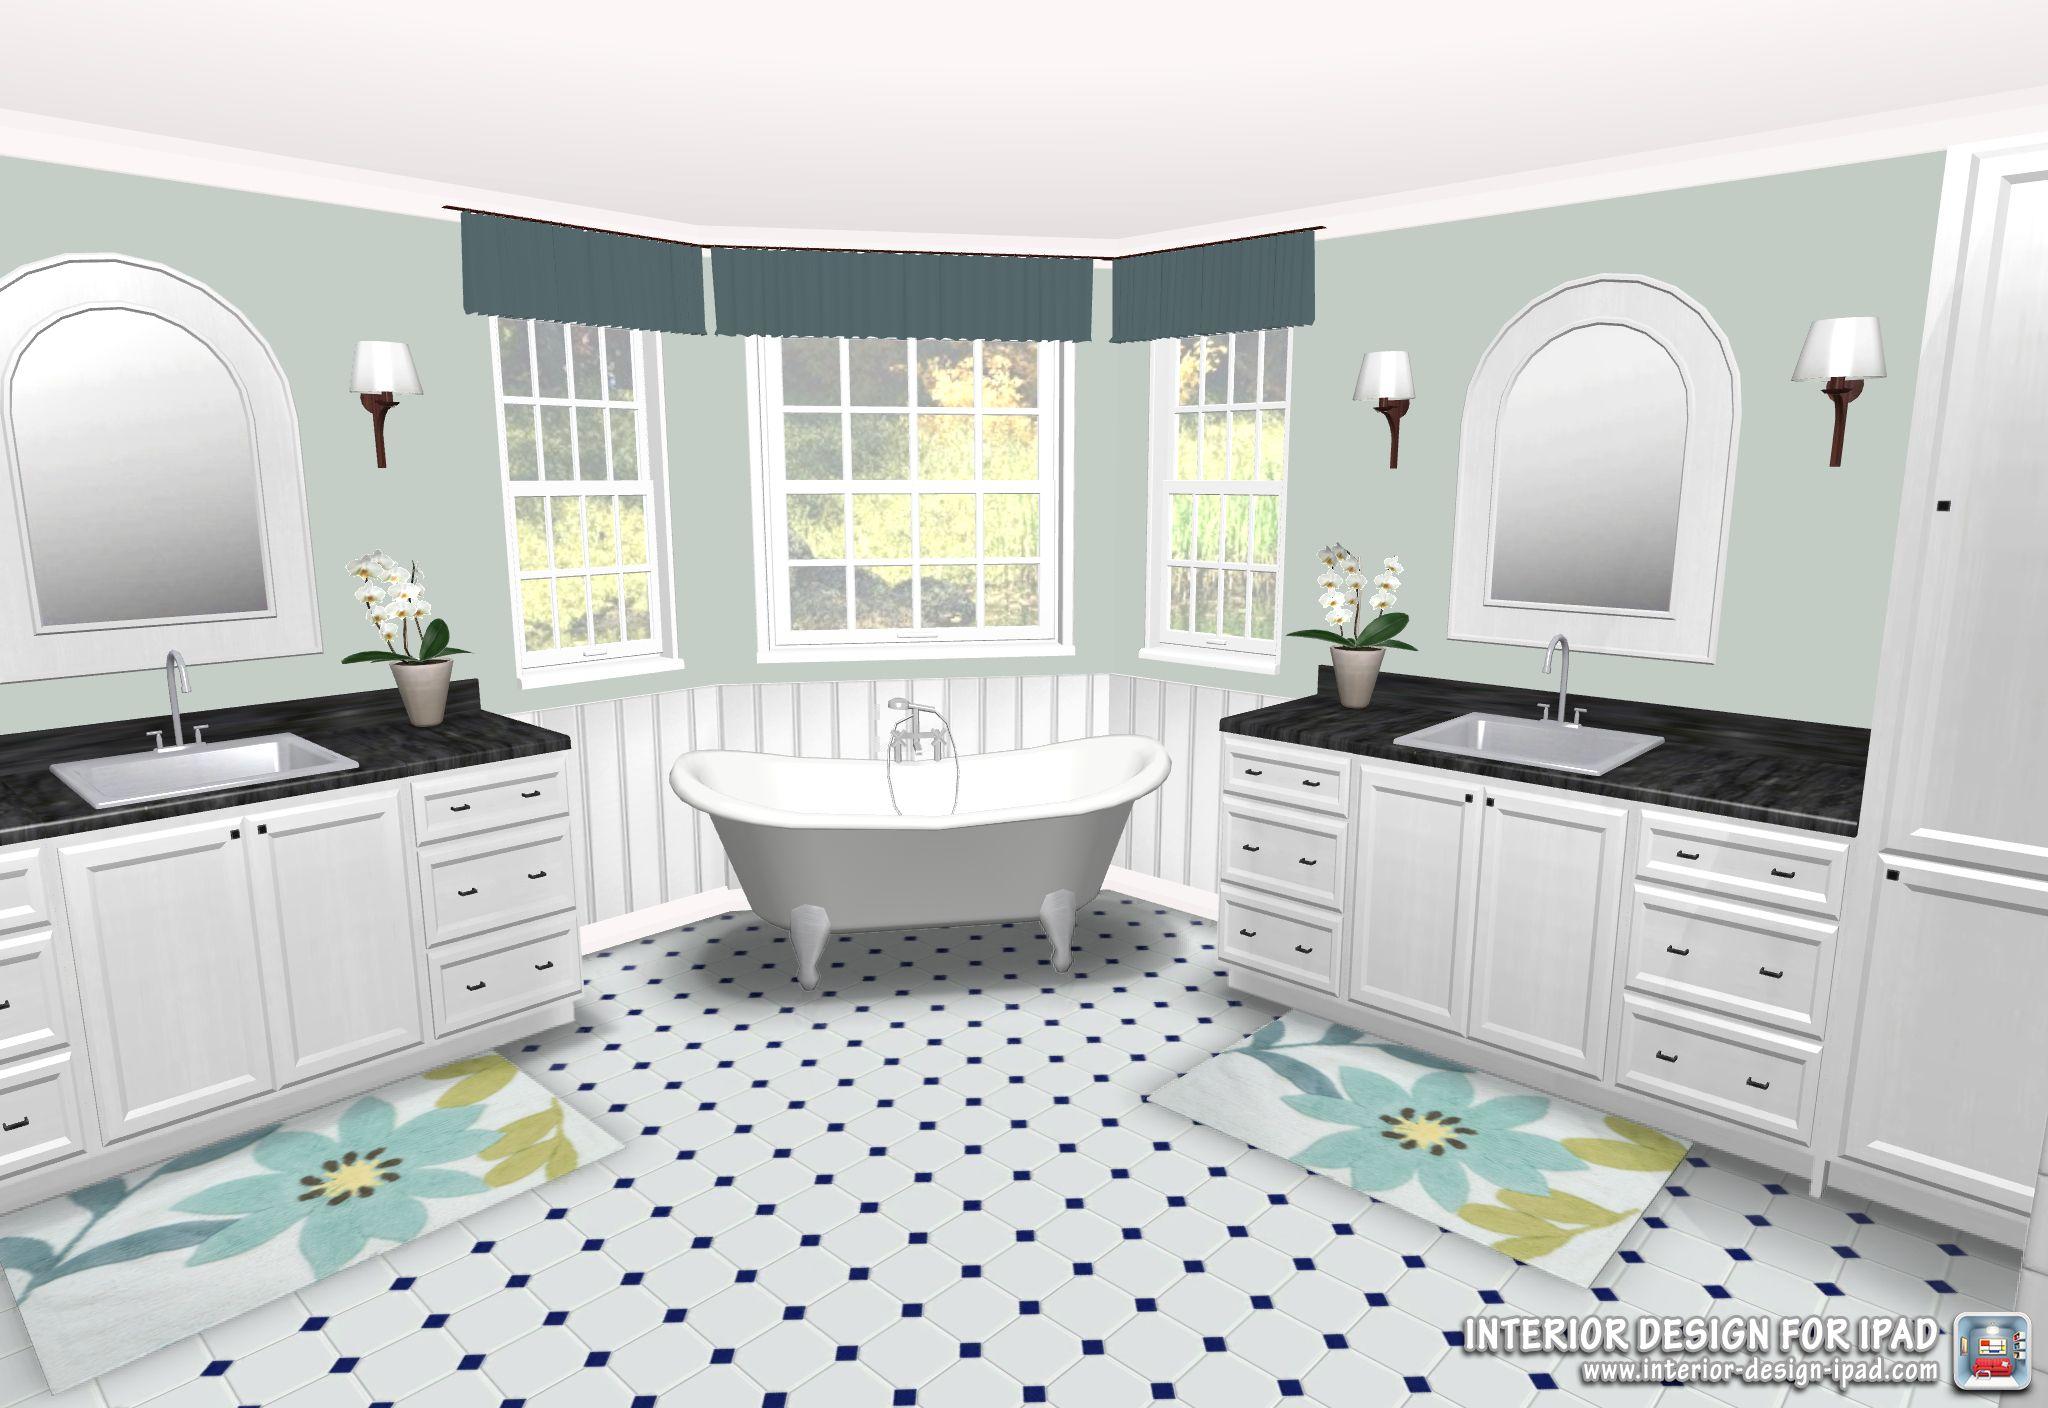 Bathroom Design App Android Bathroom Design App For Mac Bathroom ...